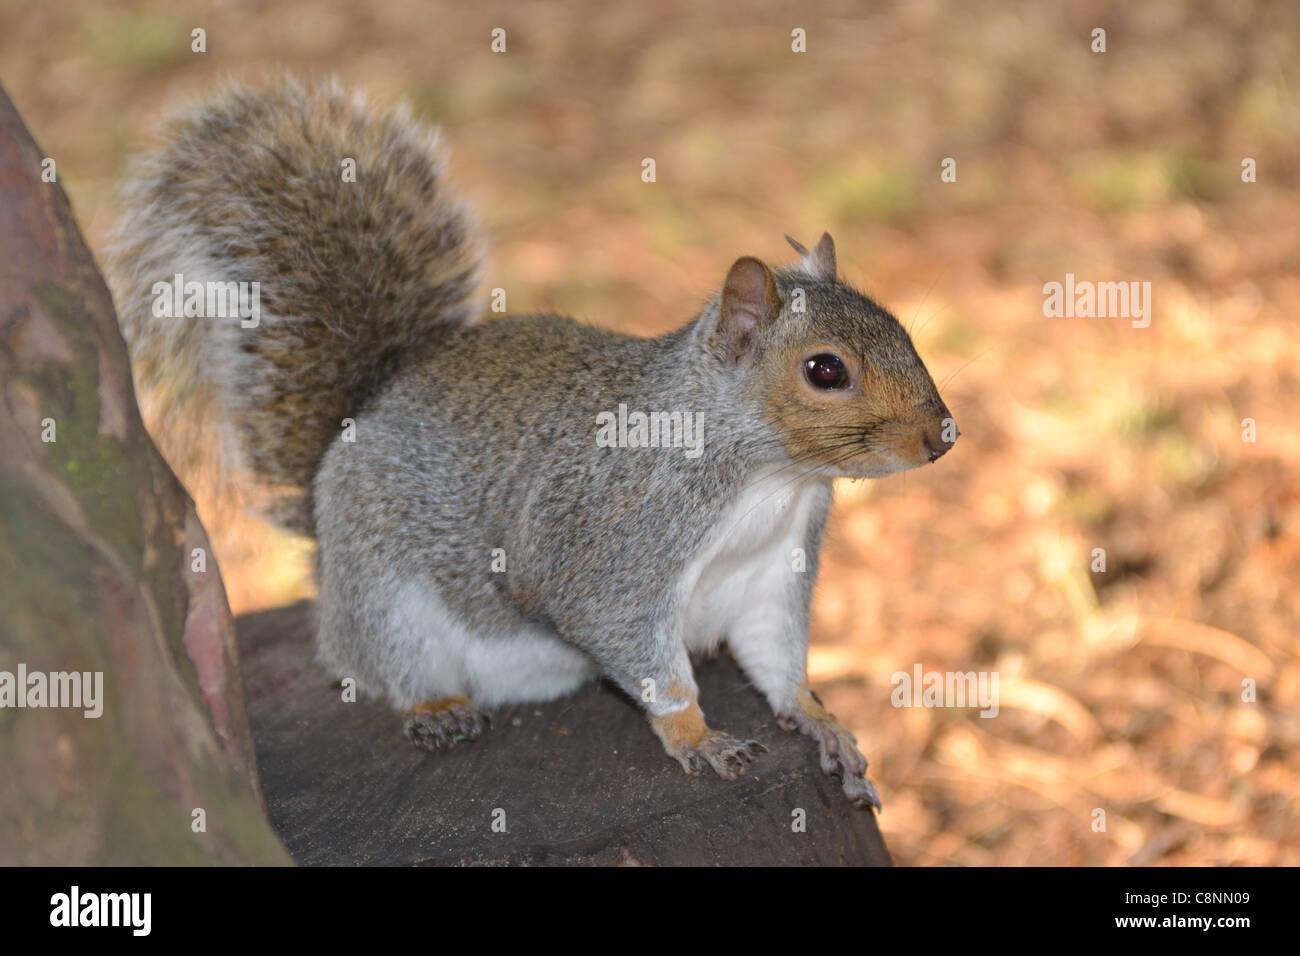 Grey Squirrel  in Autumn - Stock Image